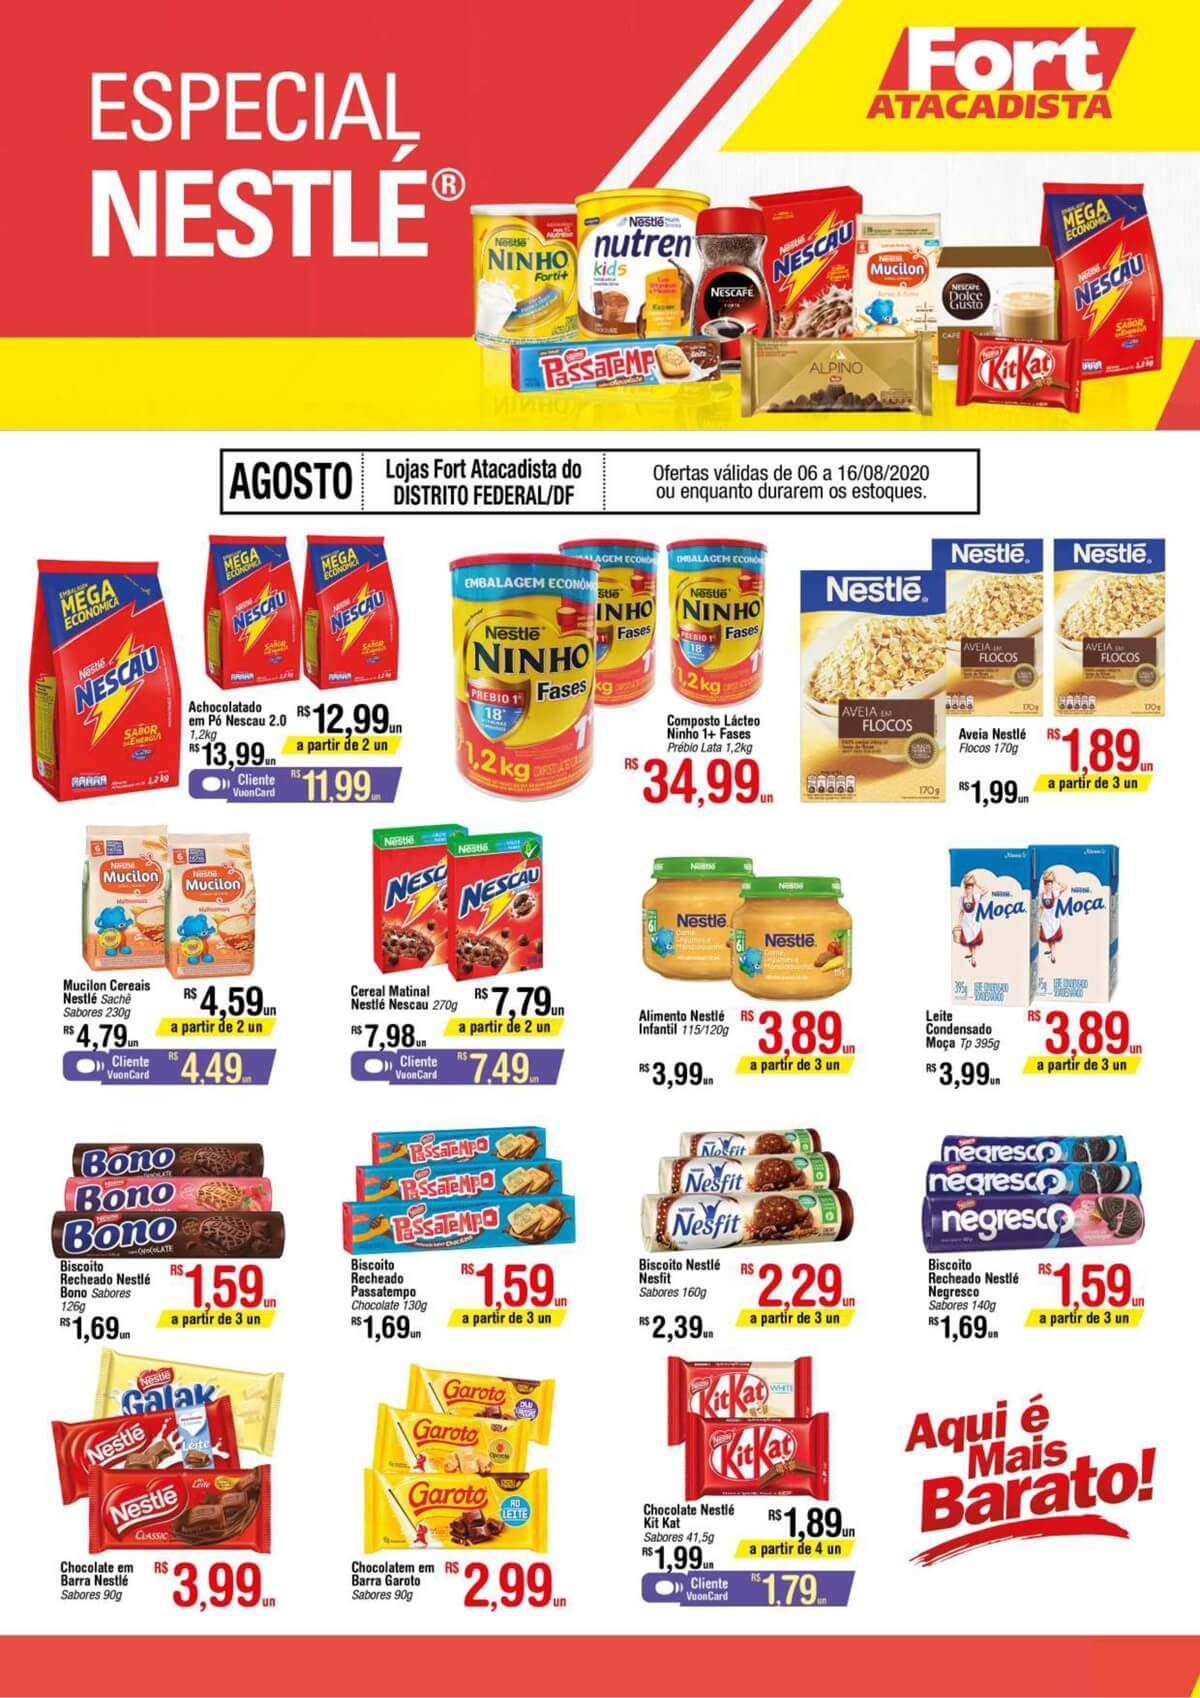 Ofertas supermercado FORT atacadista vence 16-08-1